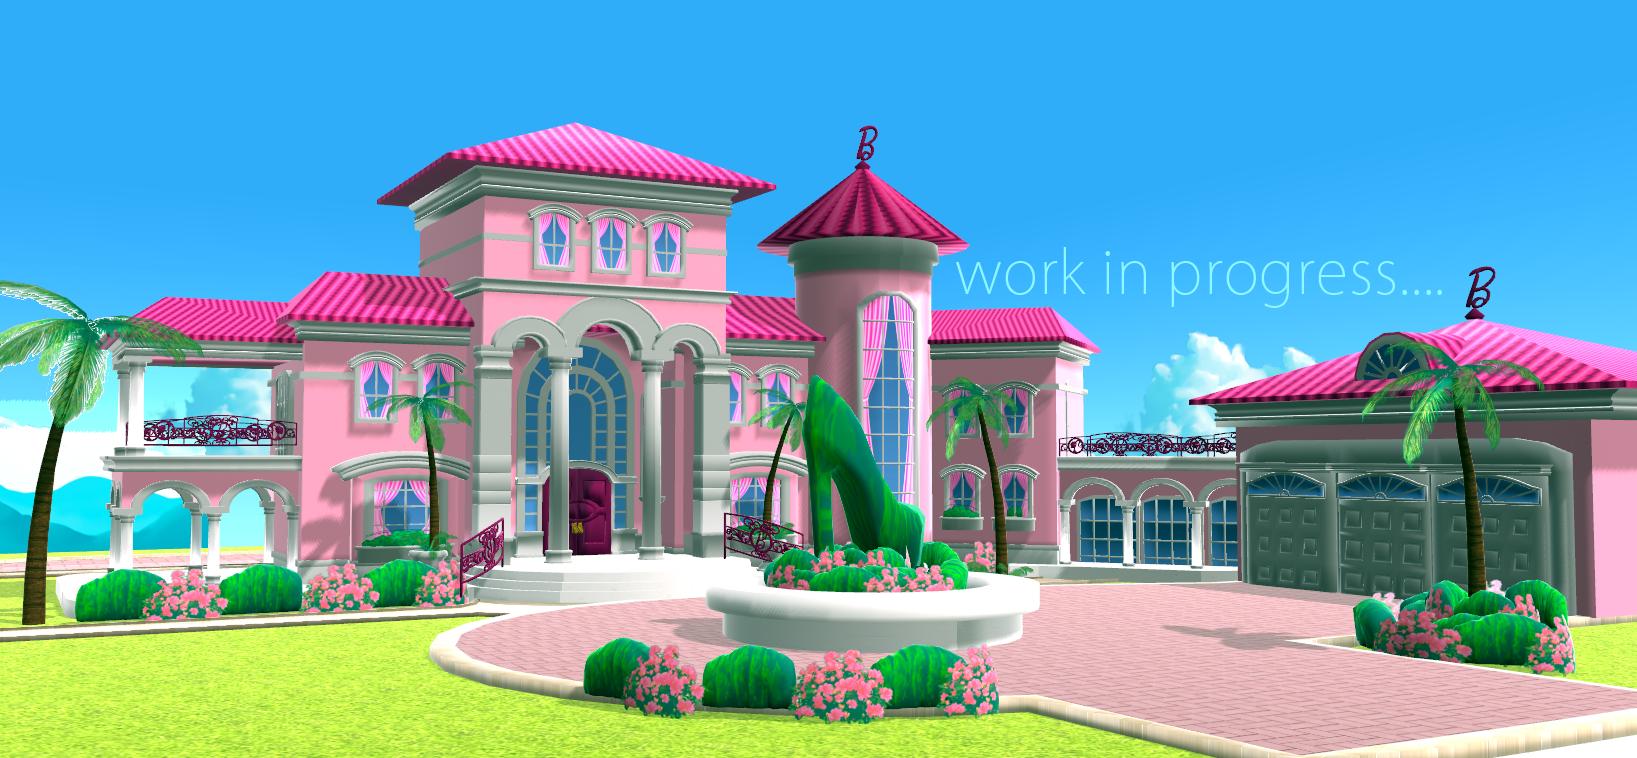 Barbie dream house wip 2 by chatterhead on deviantart for Dream house 3d